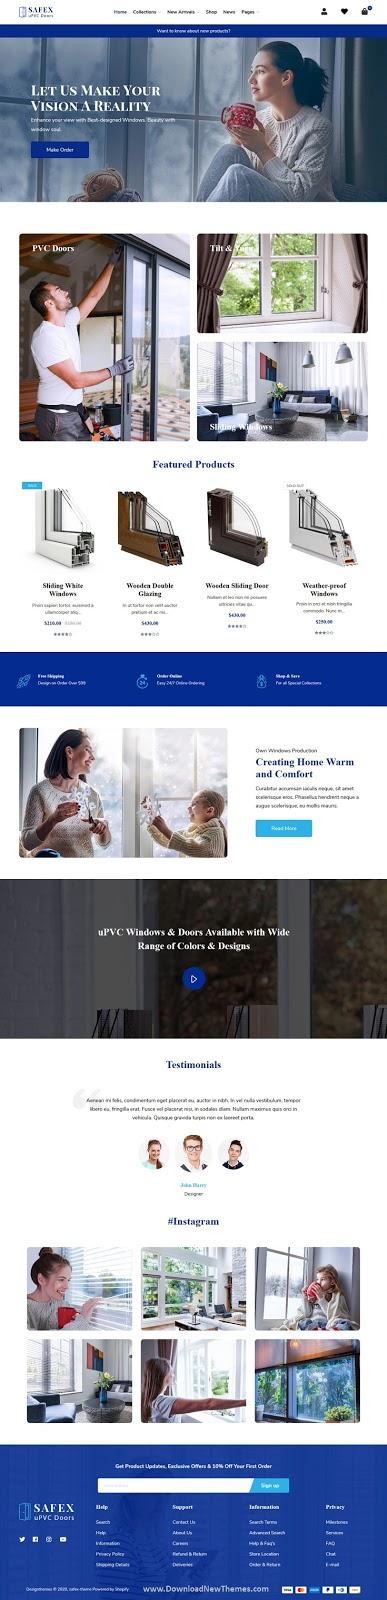 Interior Design Shopify Theme